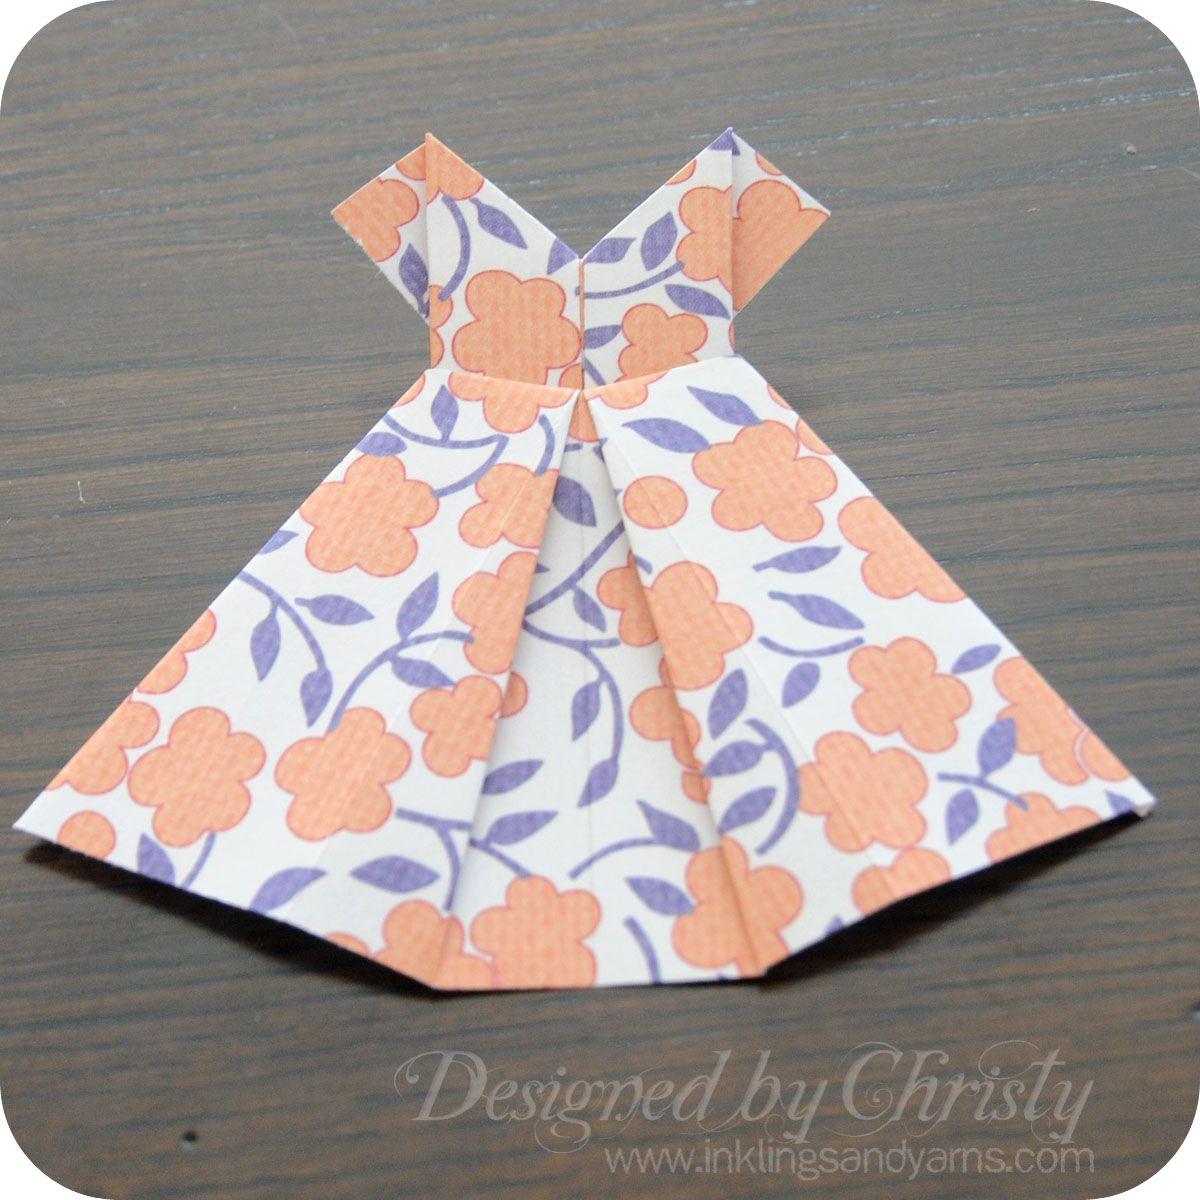 Origami dress paper crafty pinterest origami dress origami origami dress jeuxipadfo Choice Image